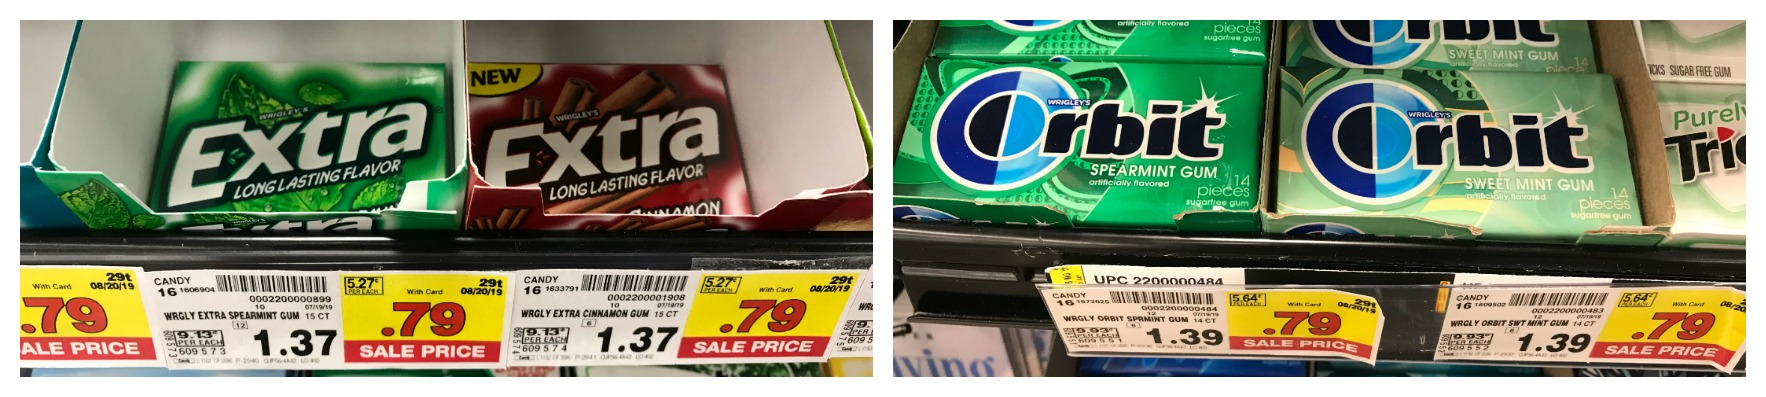 Stock Up On Orbit And Extra Gum For 54 Each At Kroger Kroger Krazy